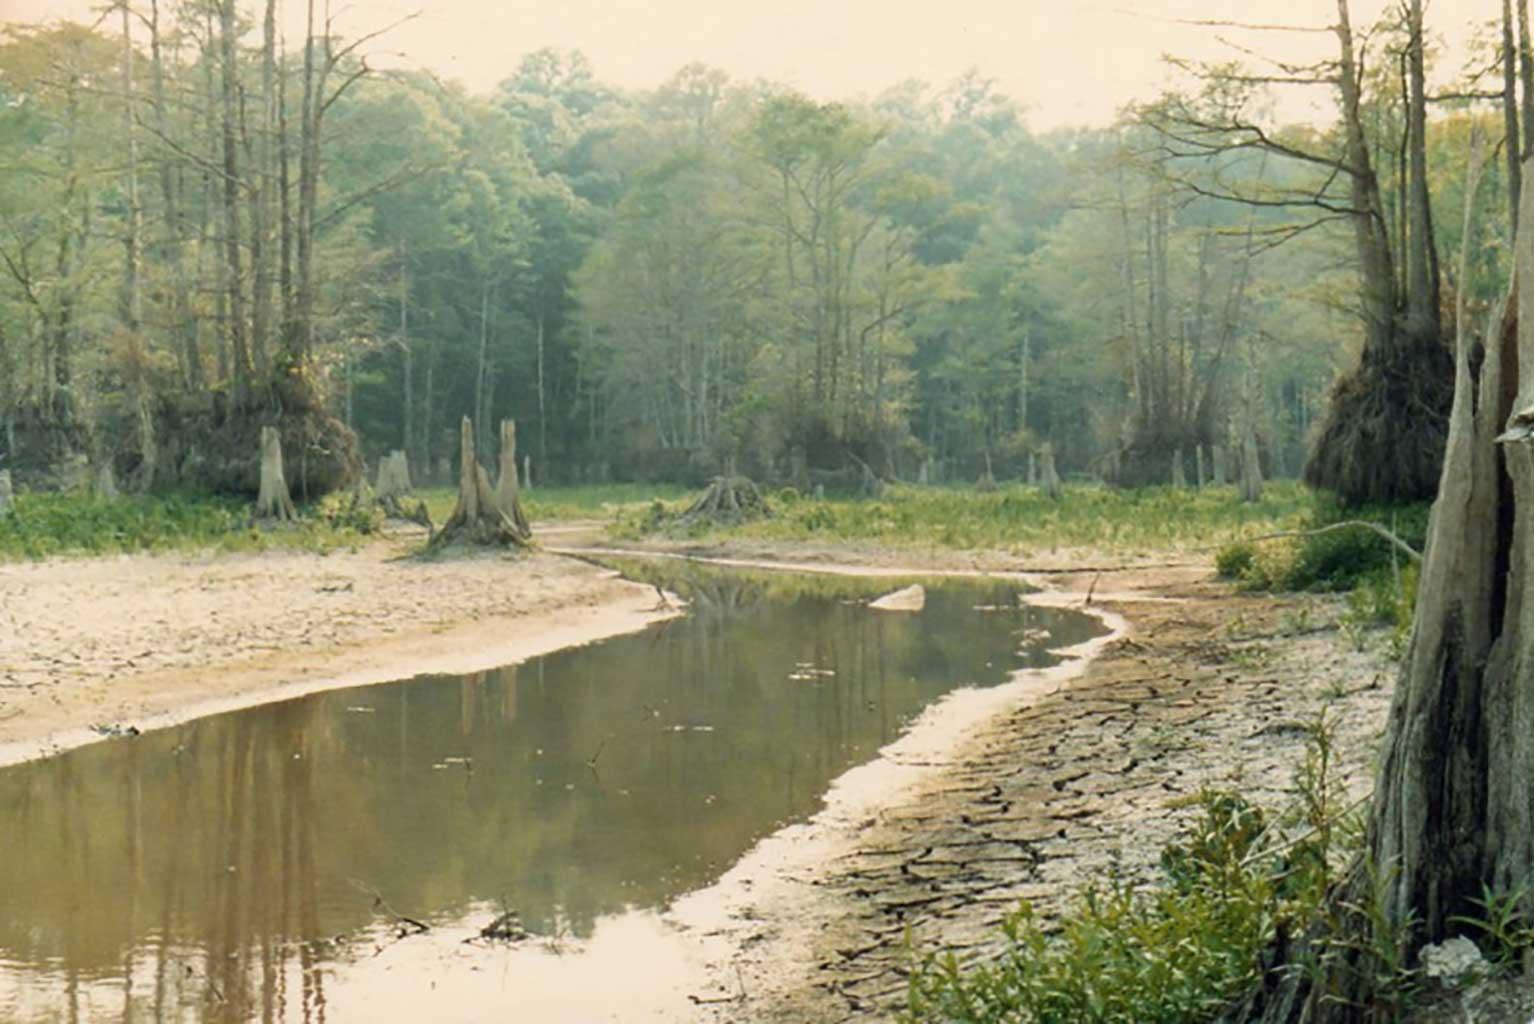 mill-pond-after-dam-broke-mg421